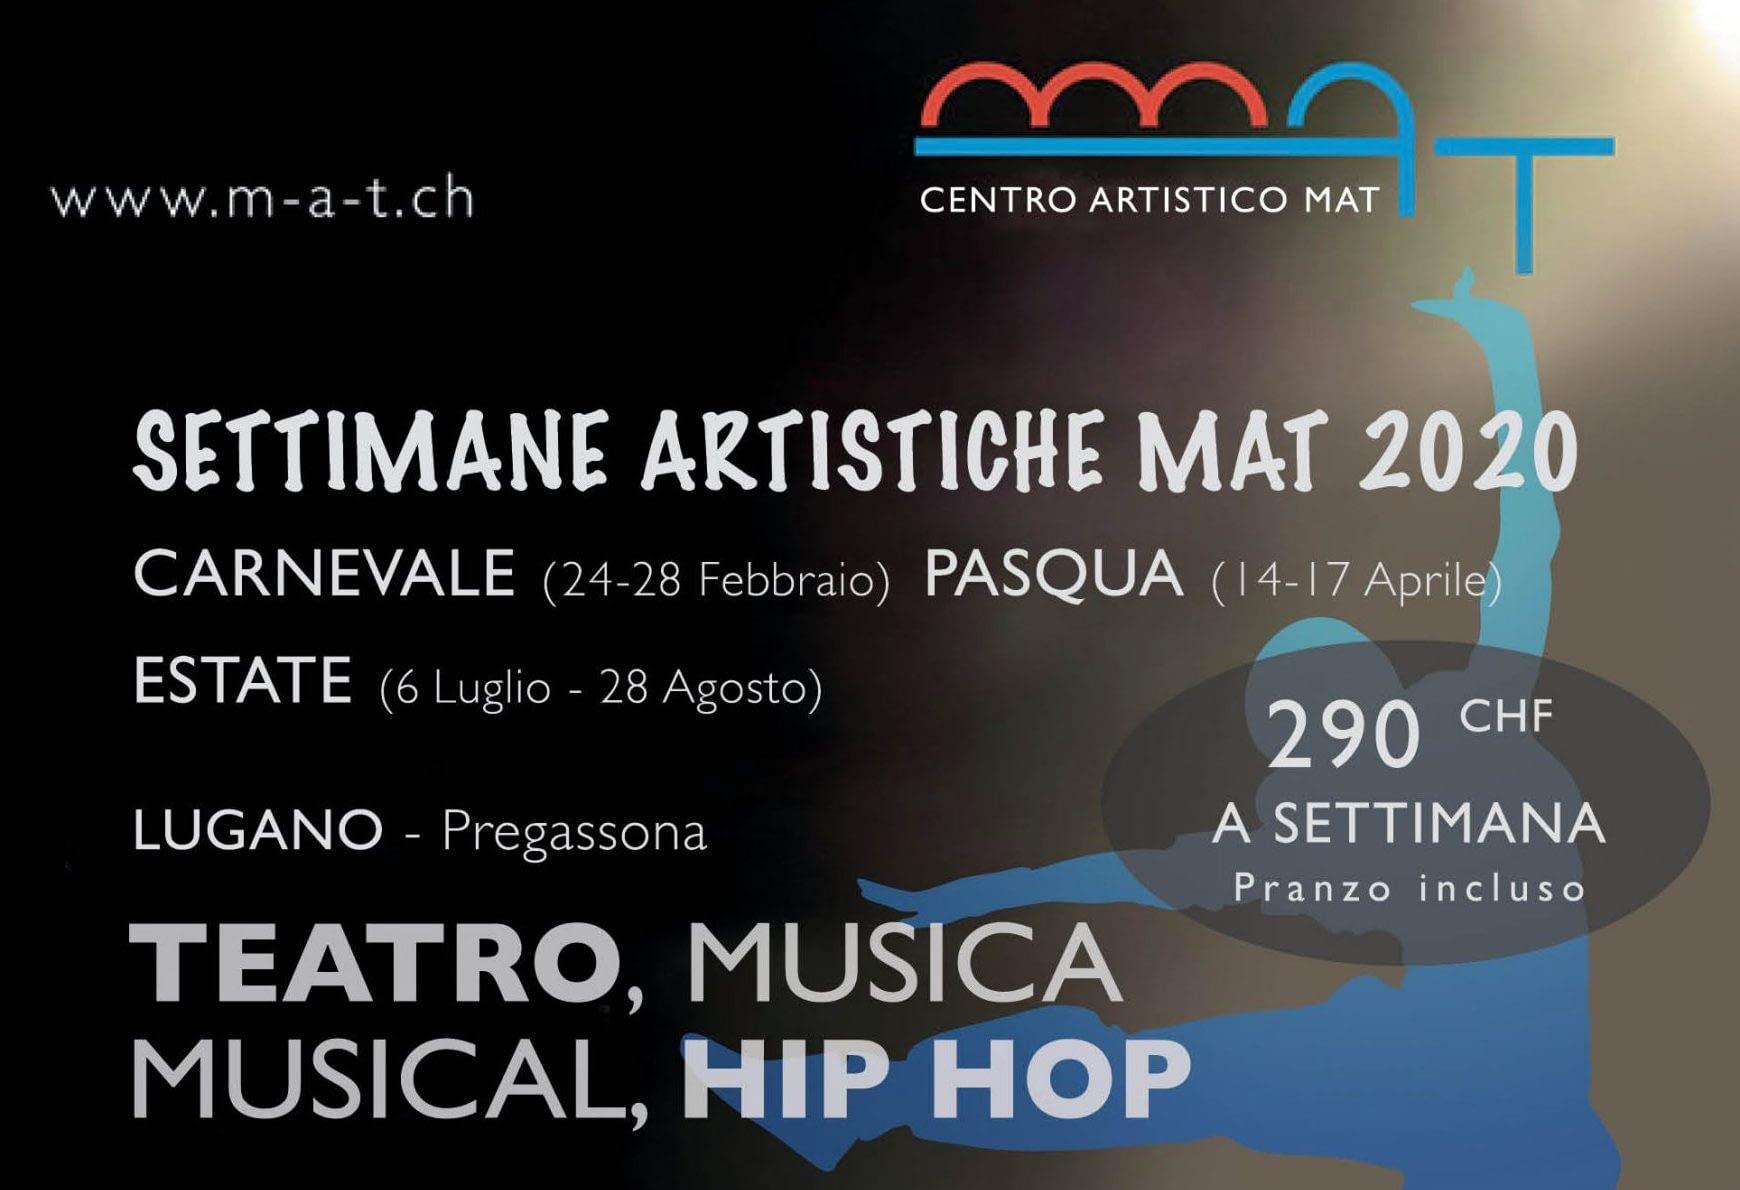 Centro Artistico MAT